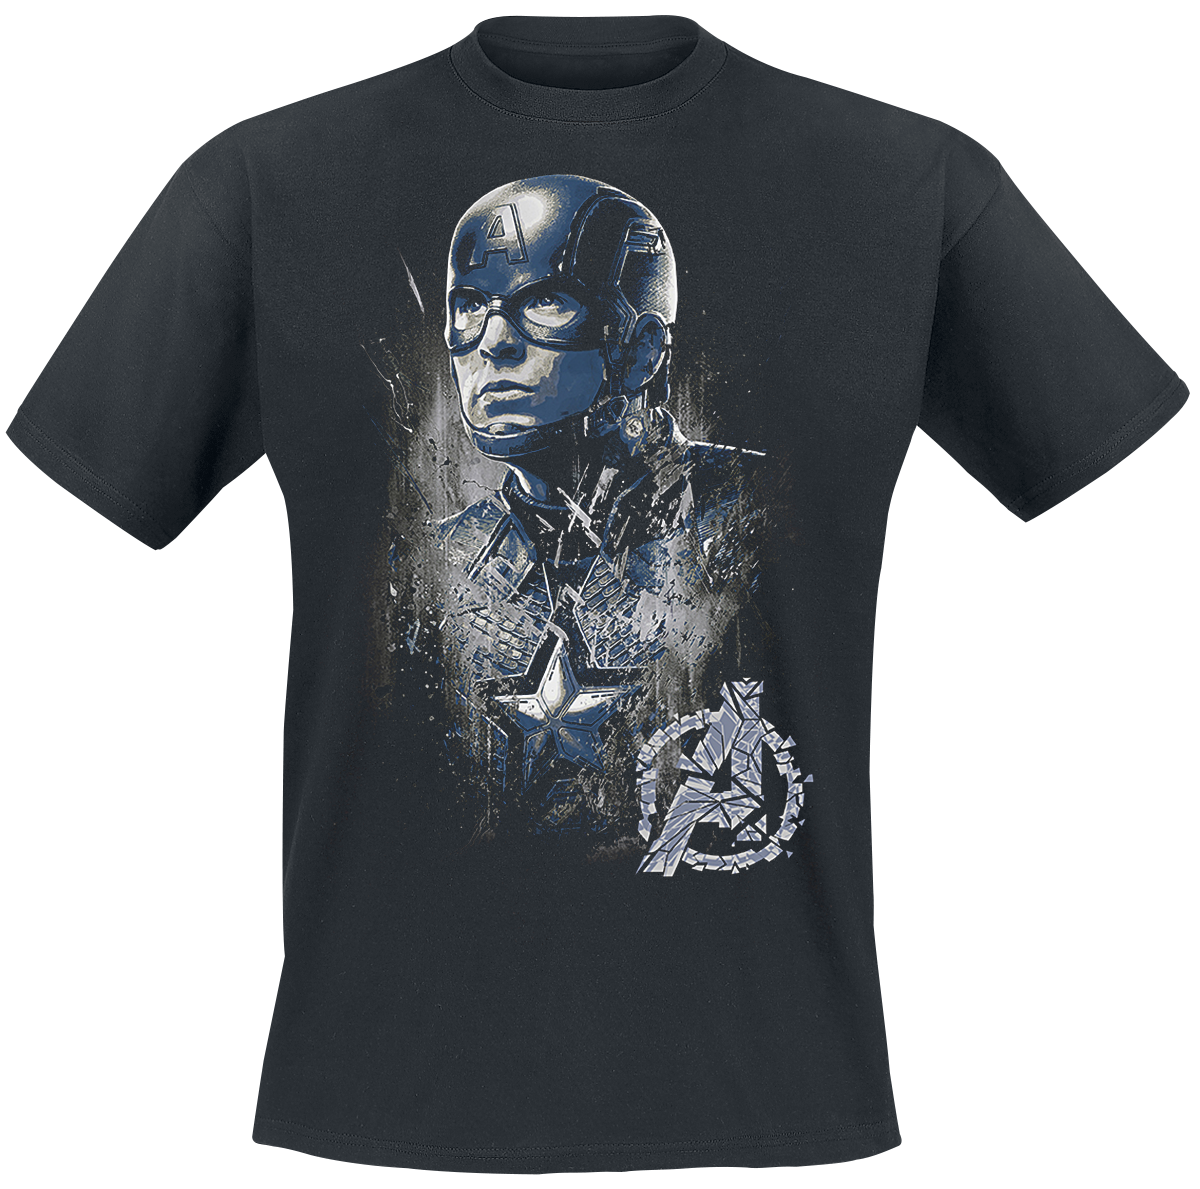 Captain America - Profile - T-Shirt - black image